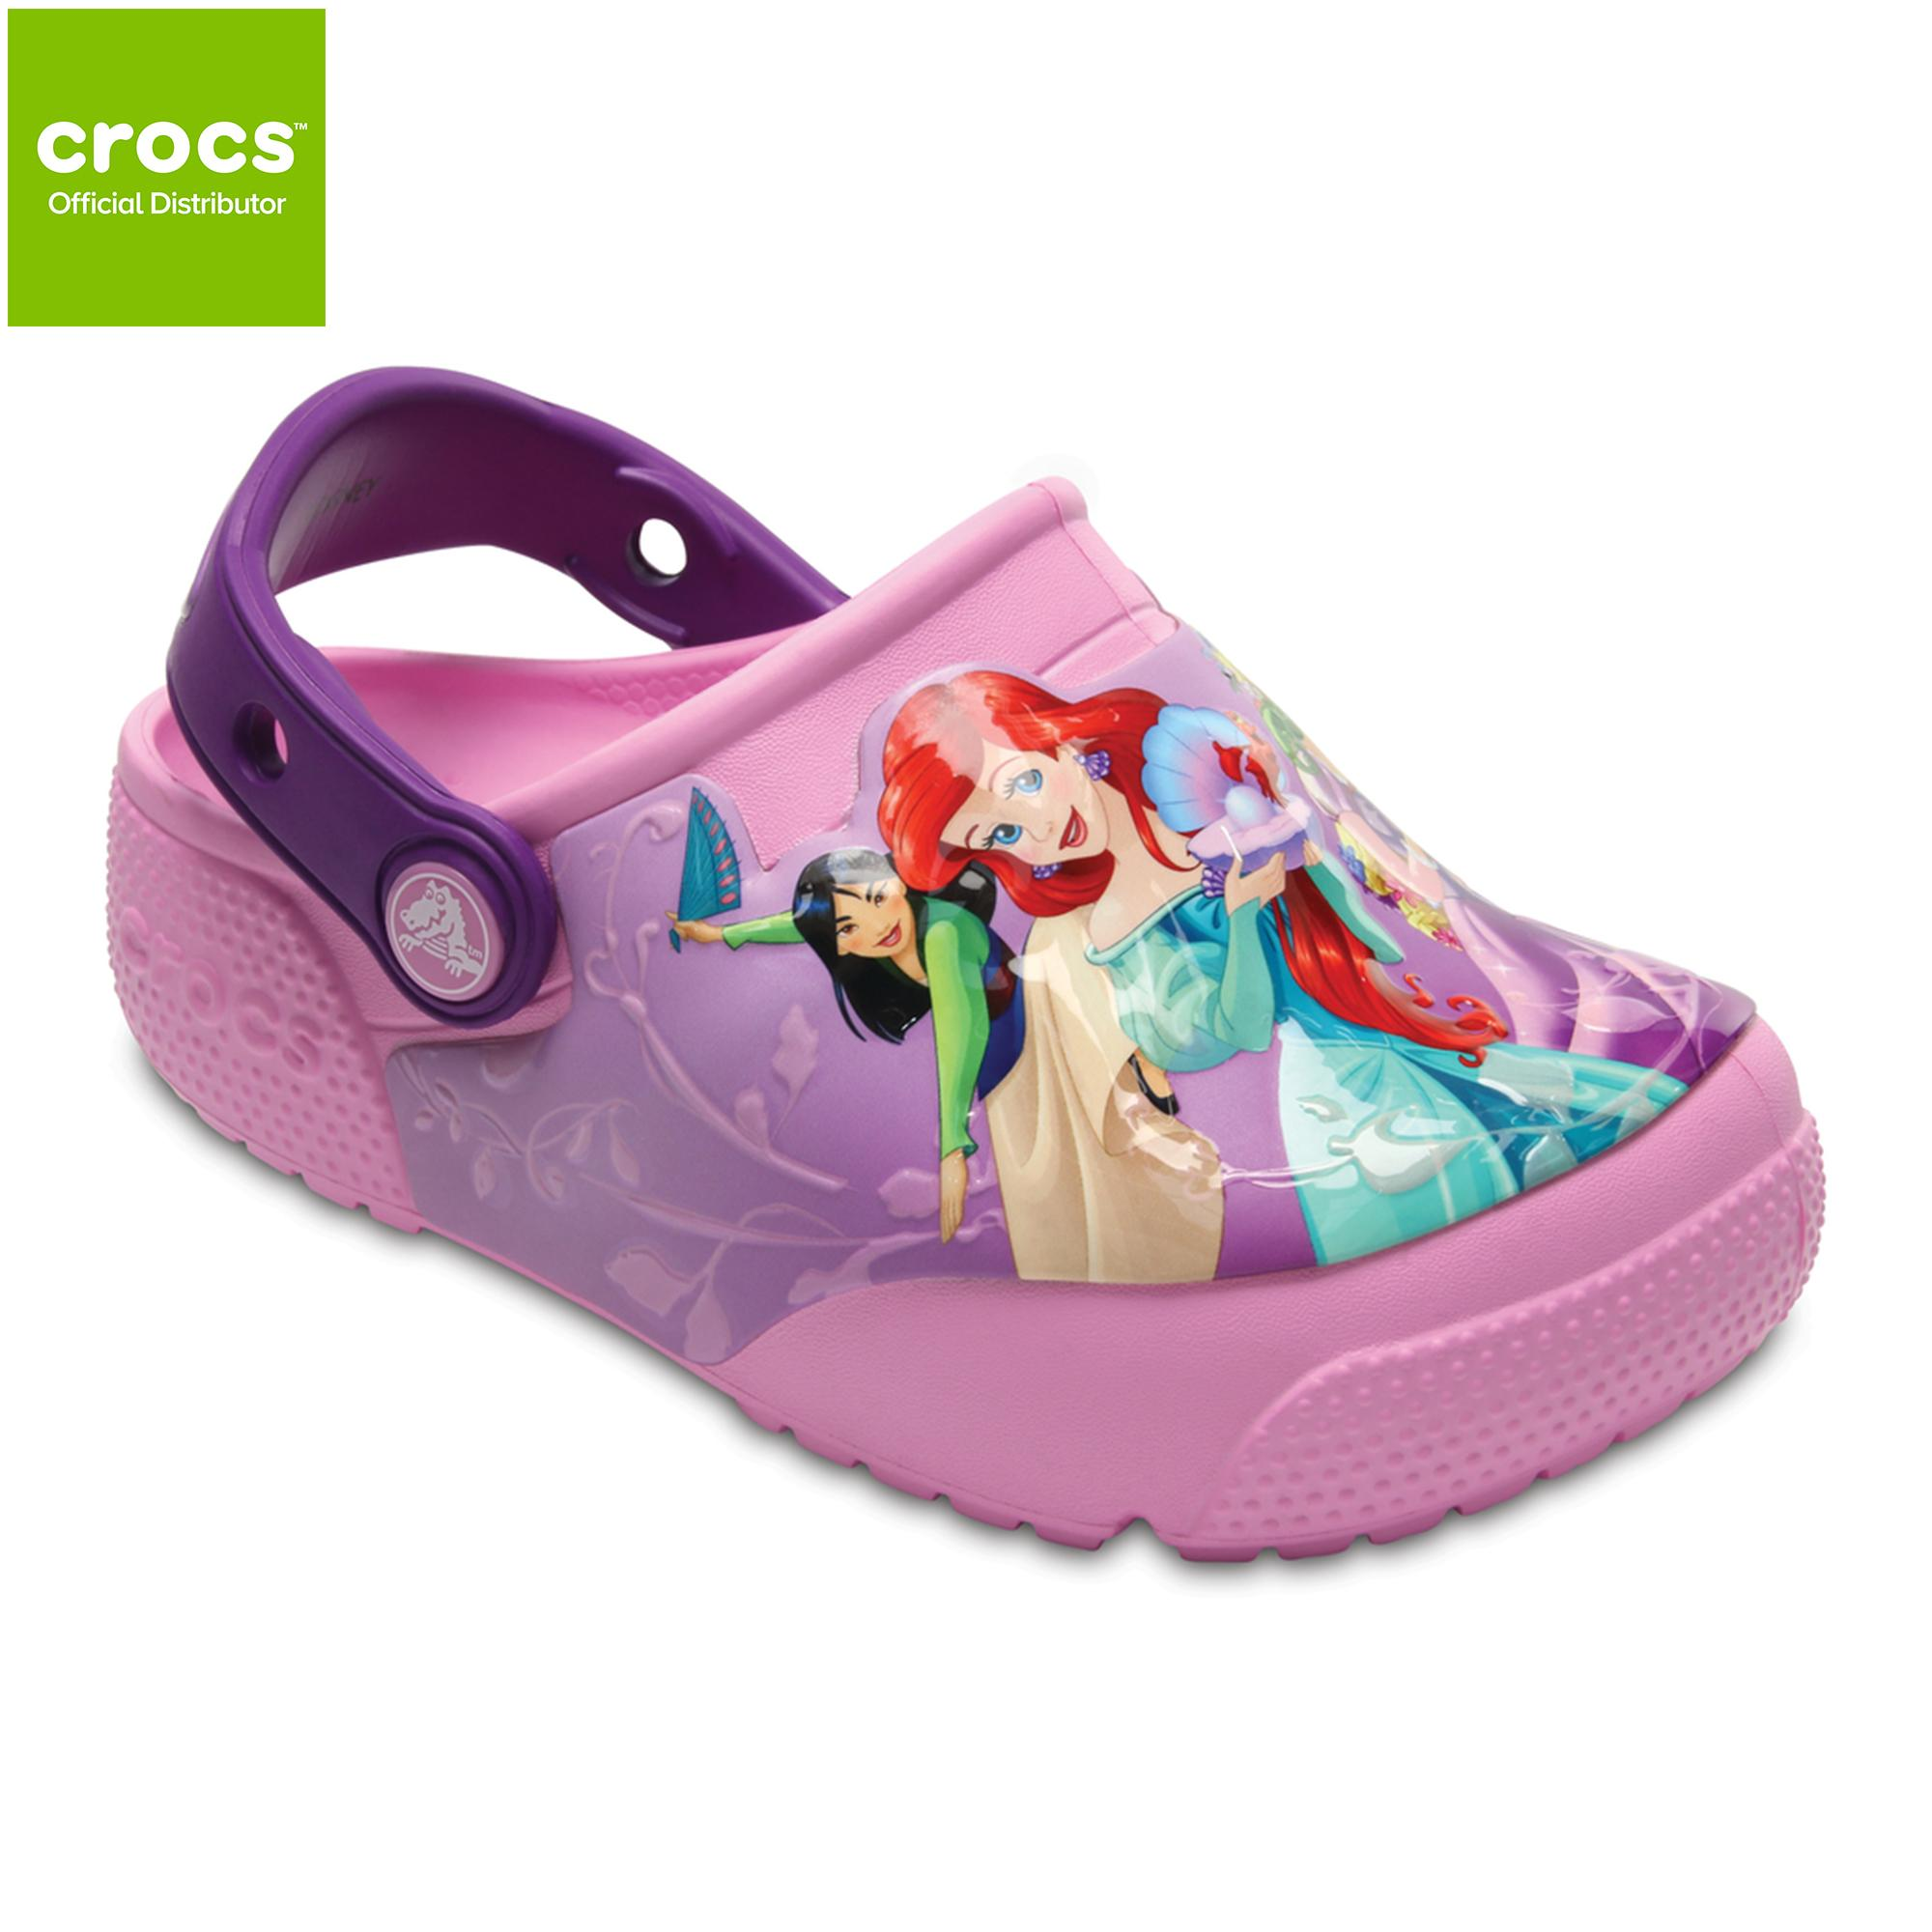 f865e6fbd835f Crocs Philippines  Crocs price list - Crocs Flats